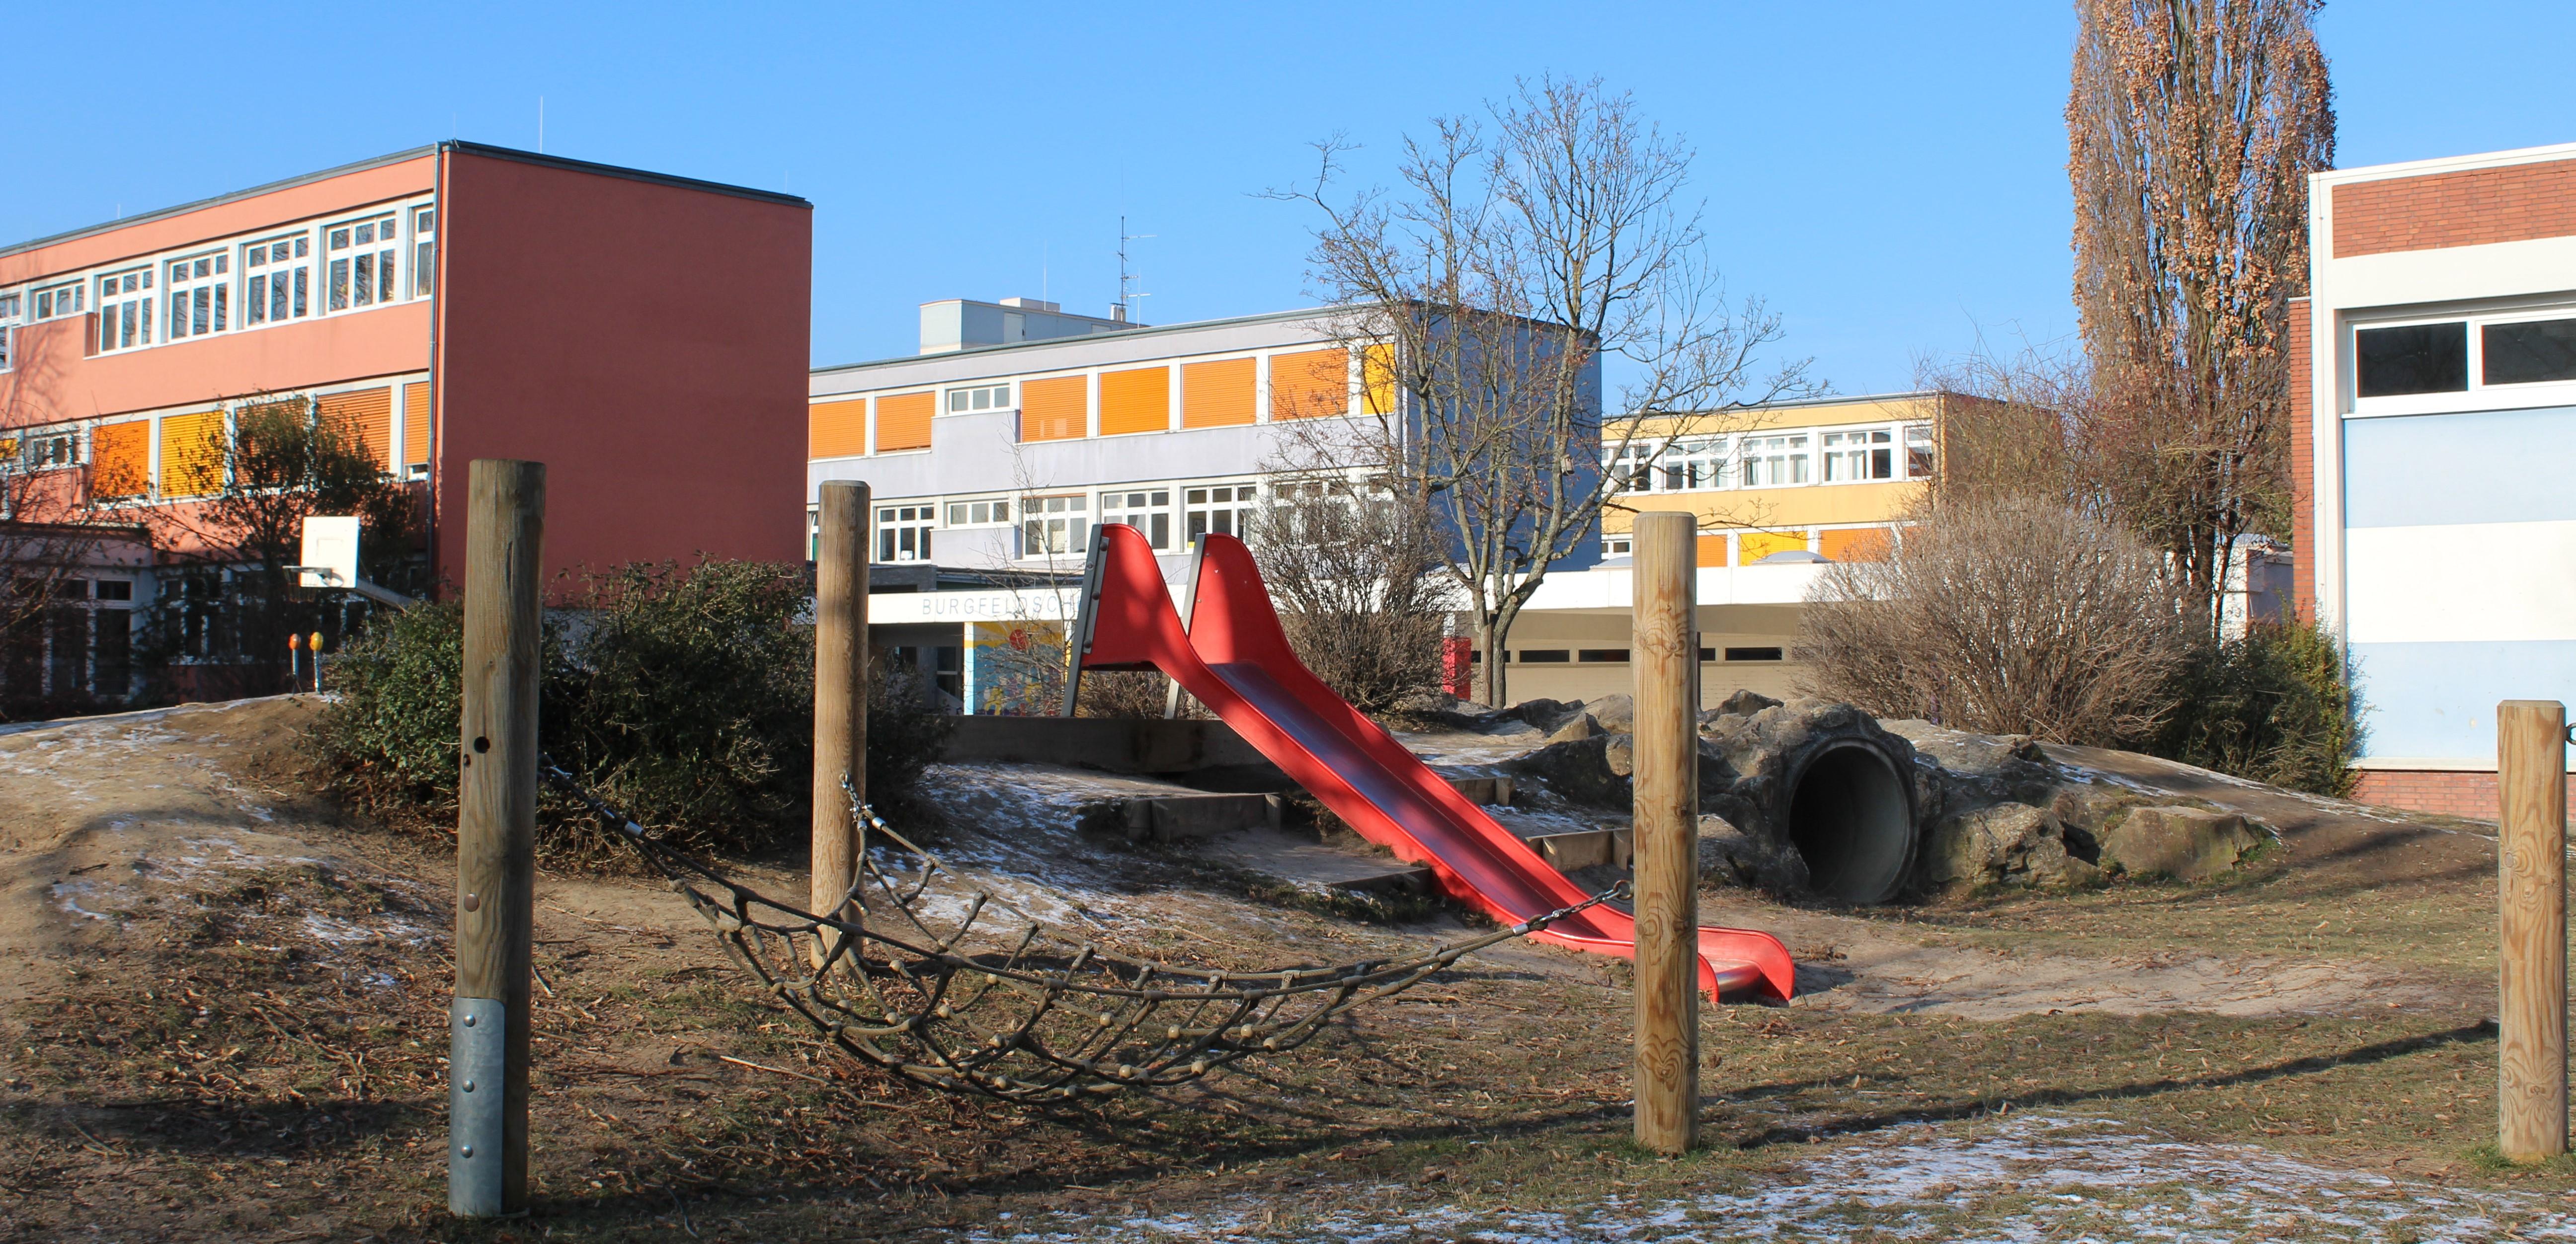 http://burgfeldschule-speyer.de/wp-content/uploads/Schule3.jpg